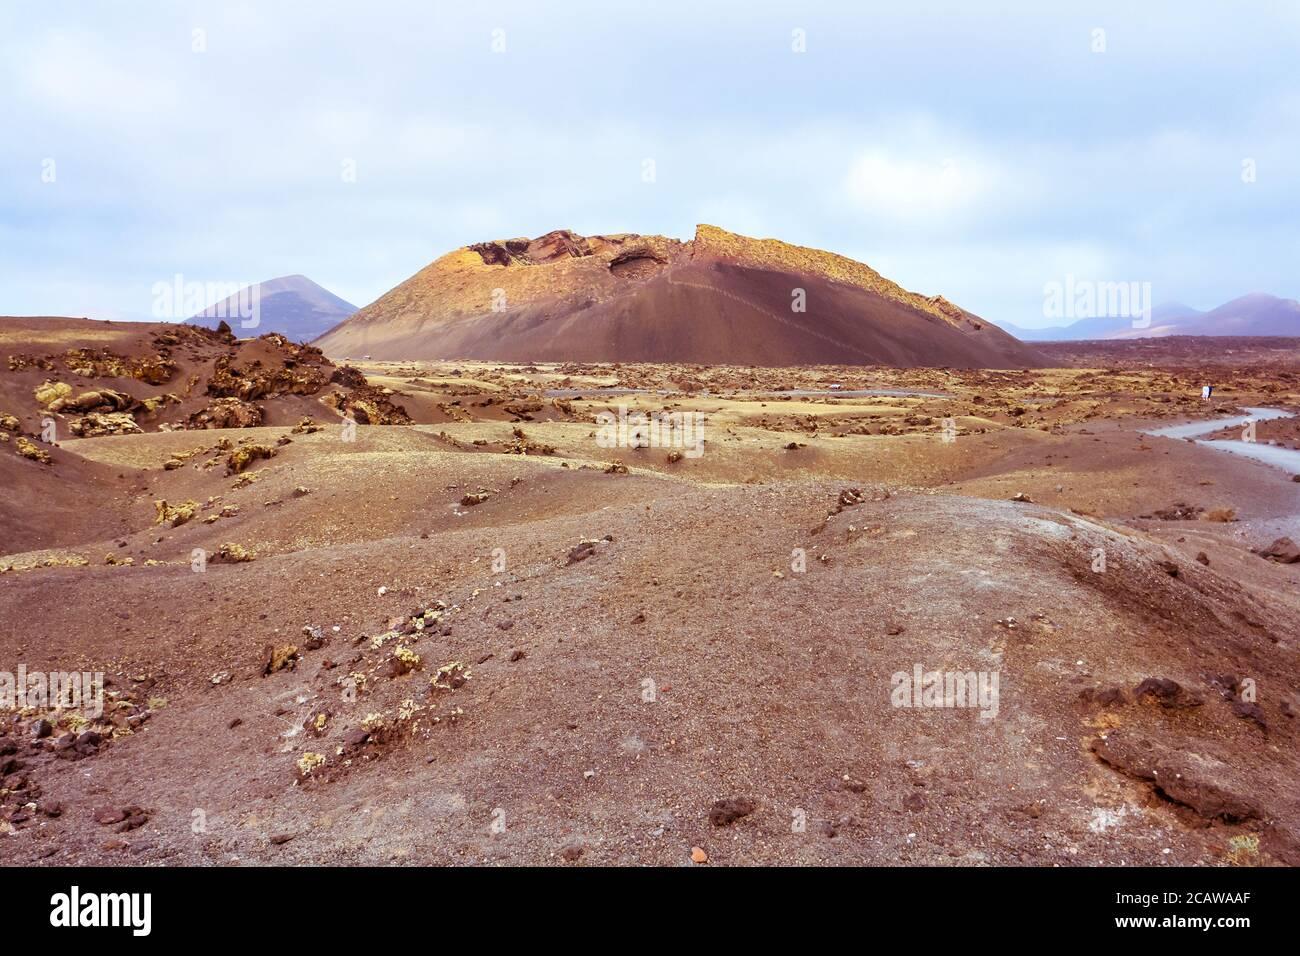 barren-volcanic-landscape-with-el-cuervo